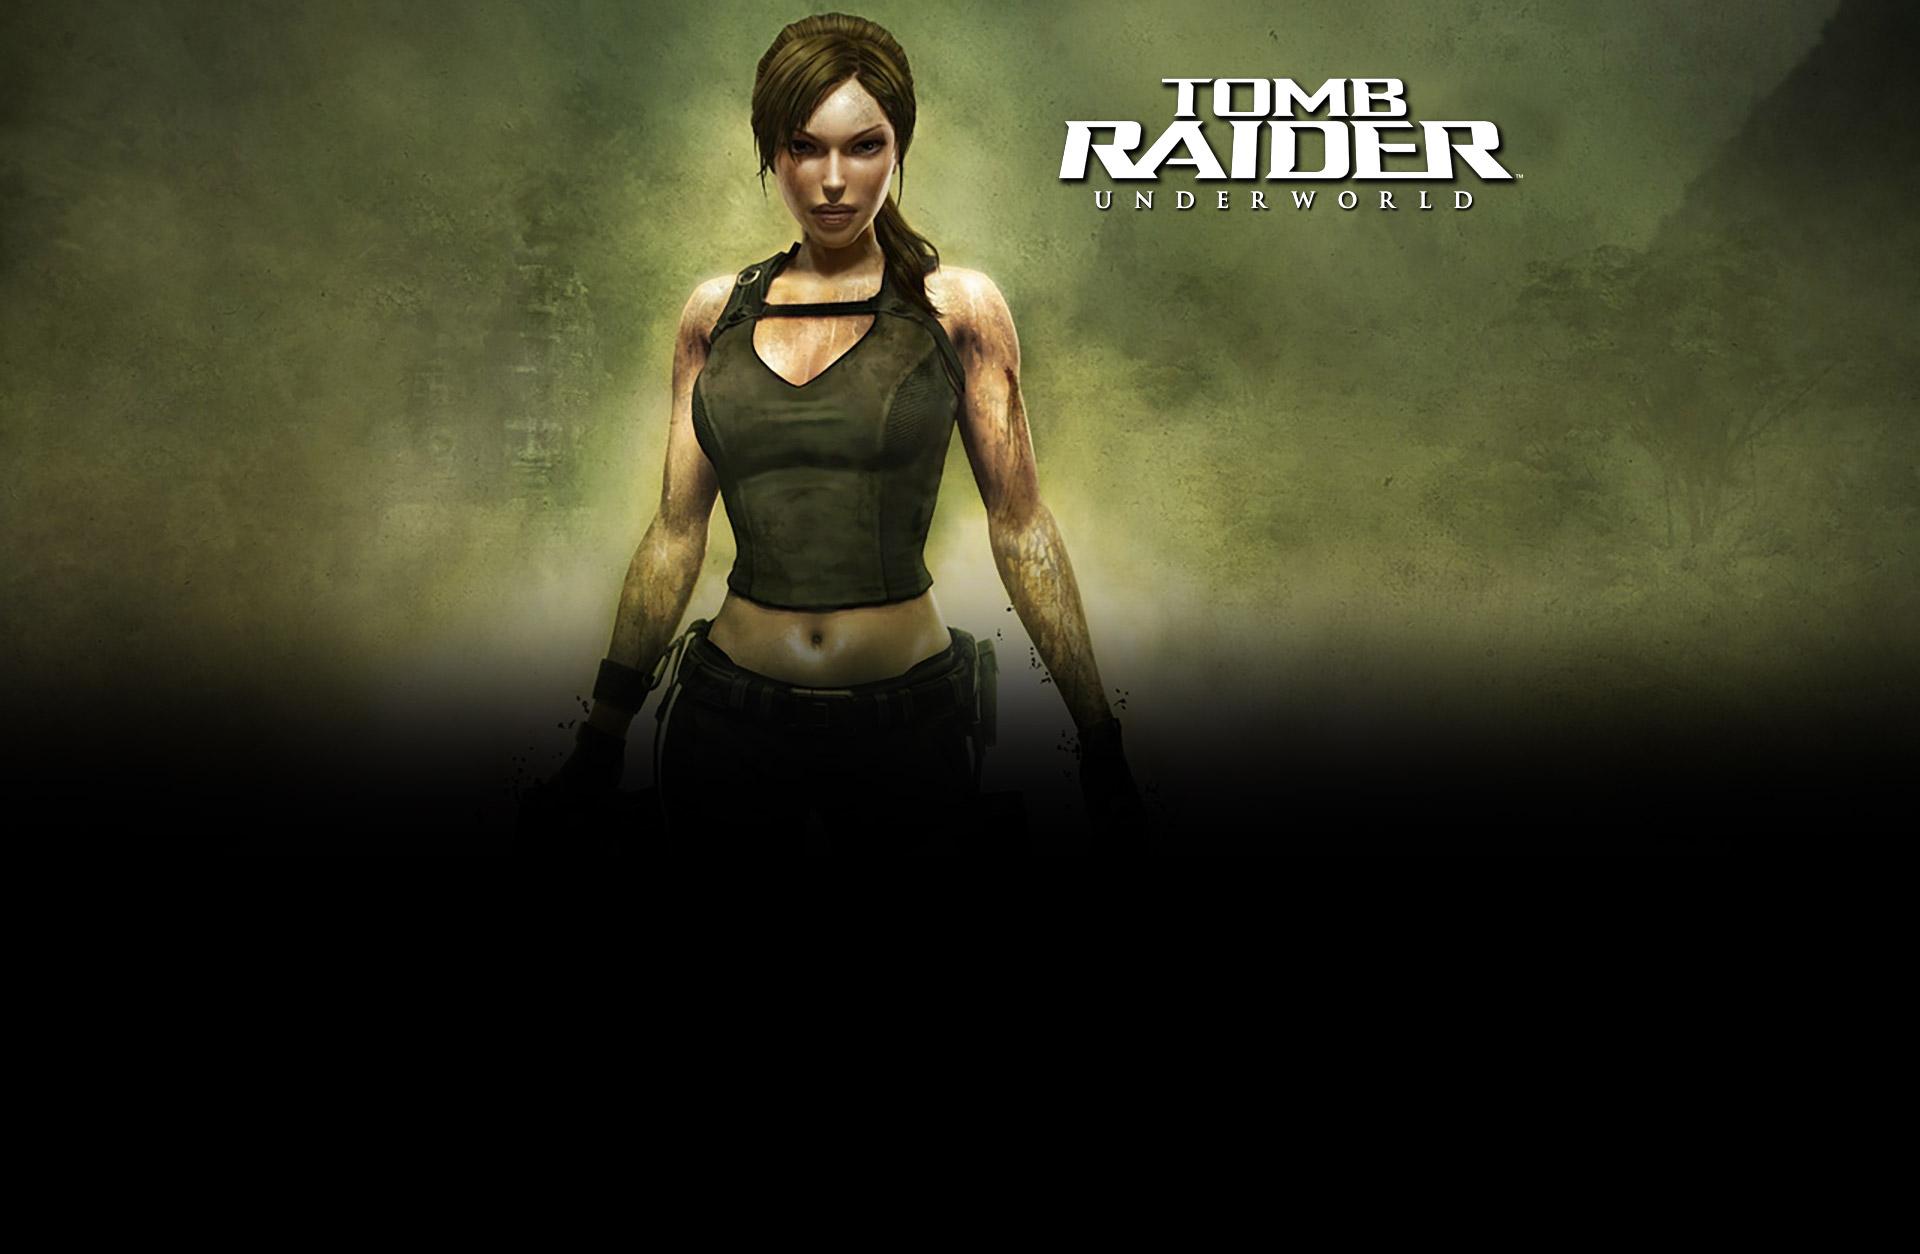 Buy Tomb Raider Underworld On Gamesload